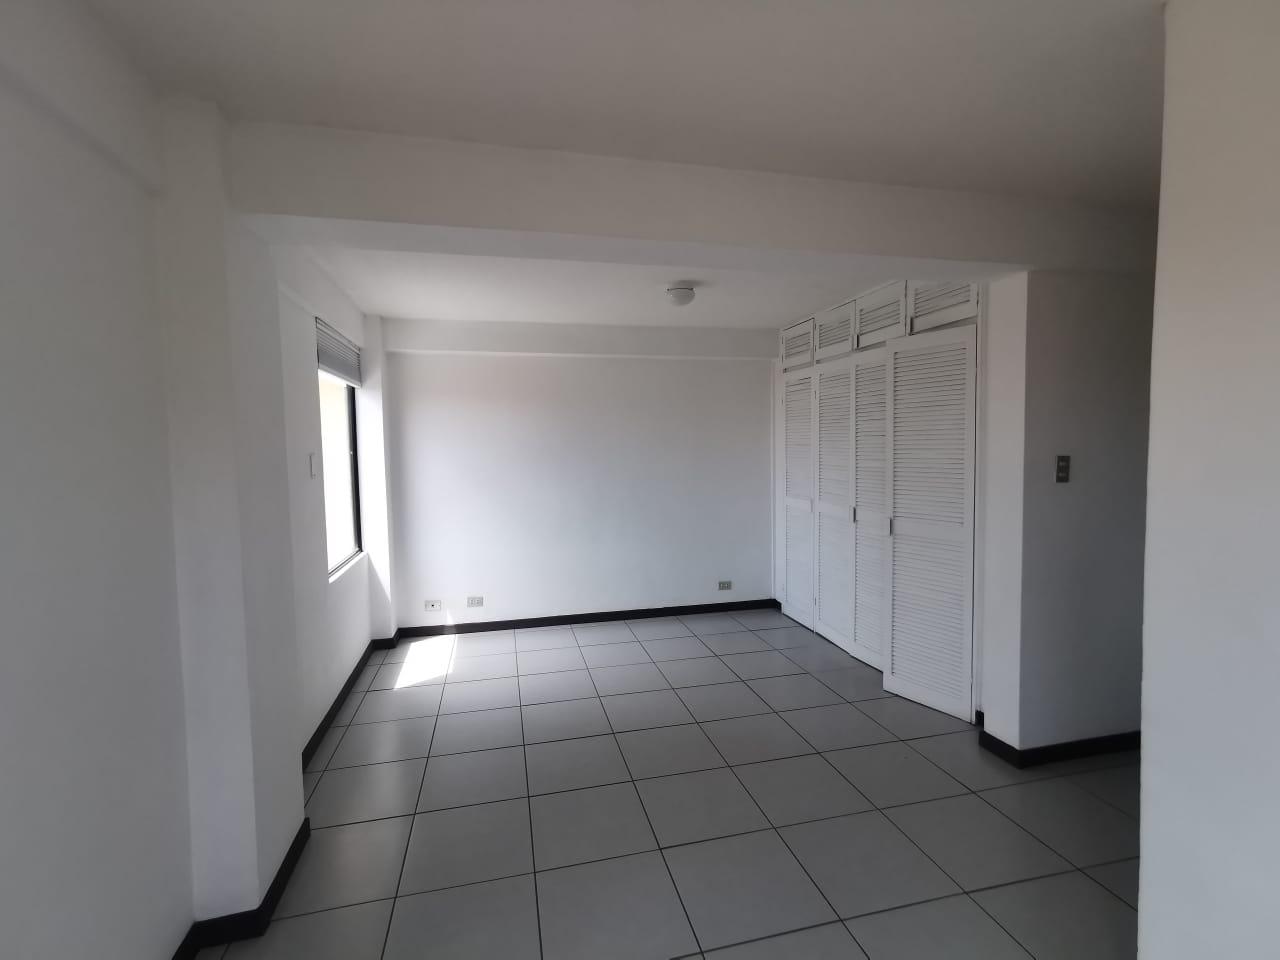 2322 Se alquila apartamento en Trejos Montealegre.